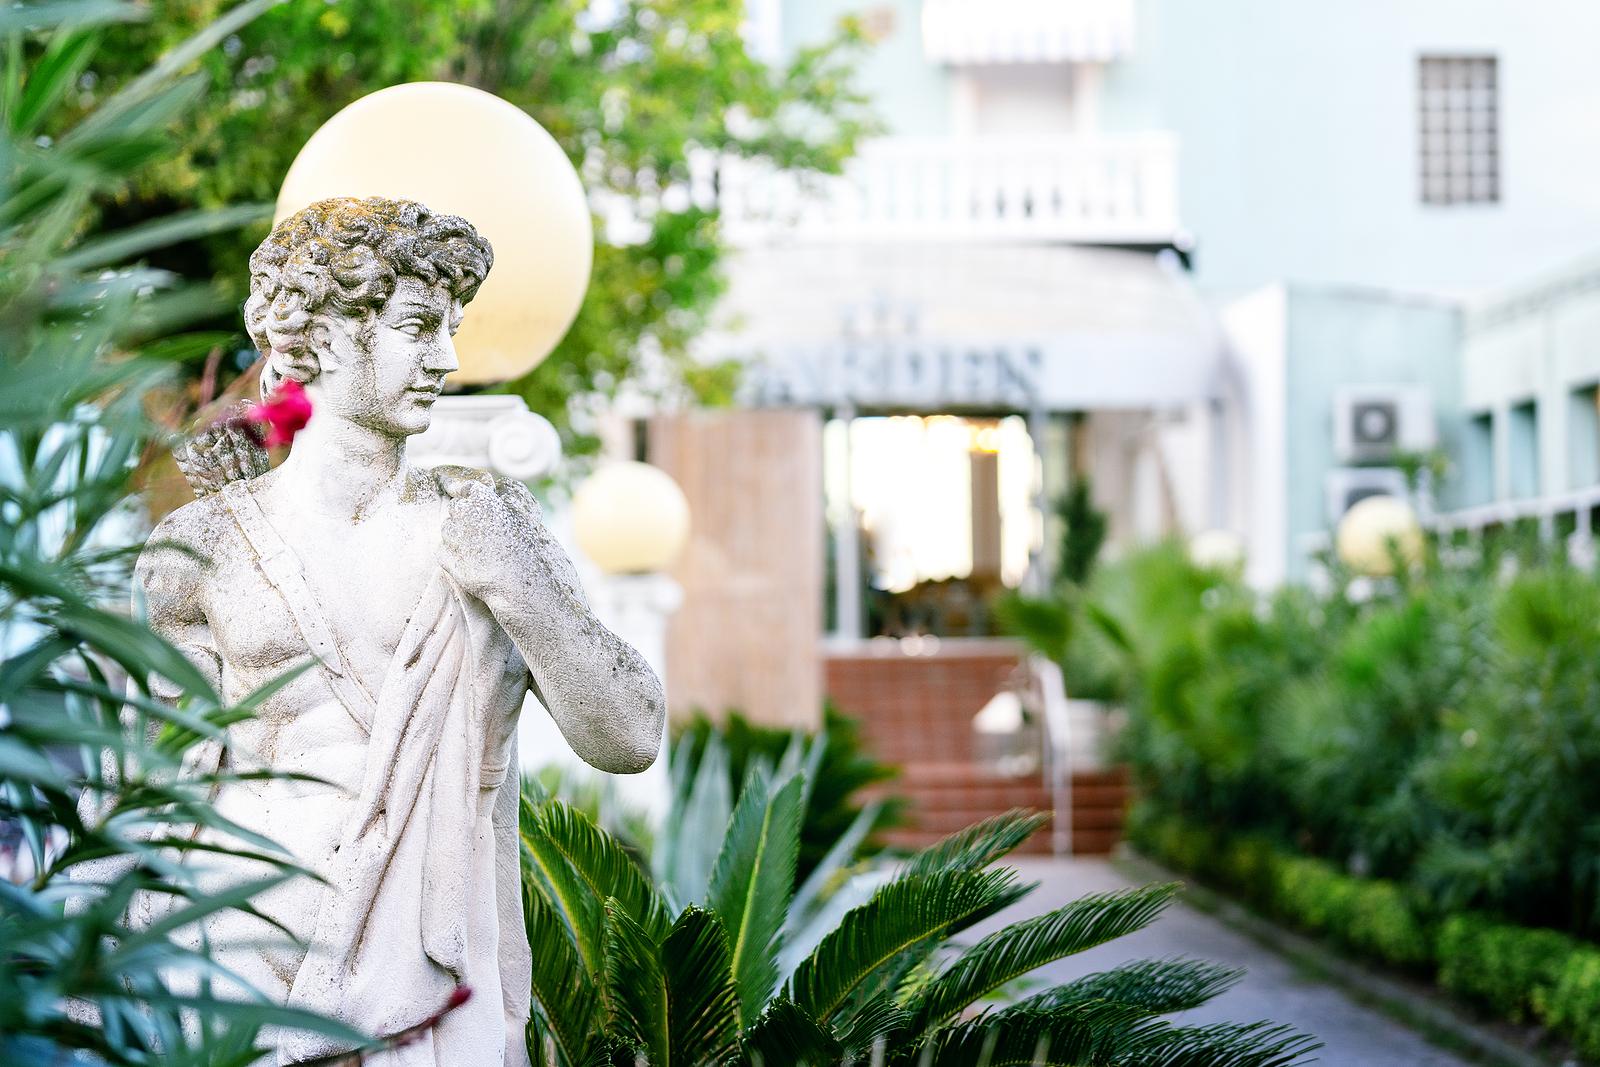 Outdoor Sculpture Installation